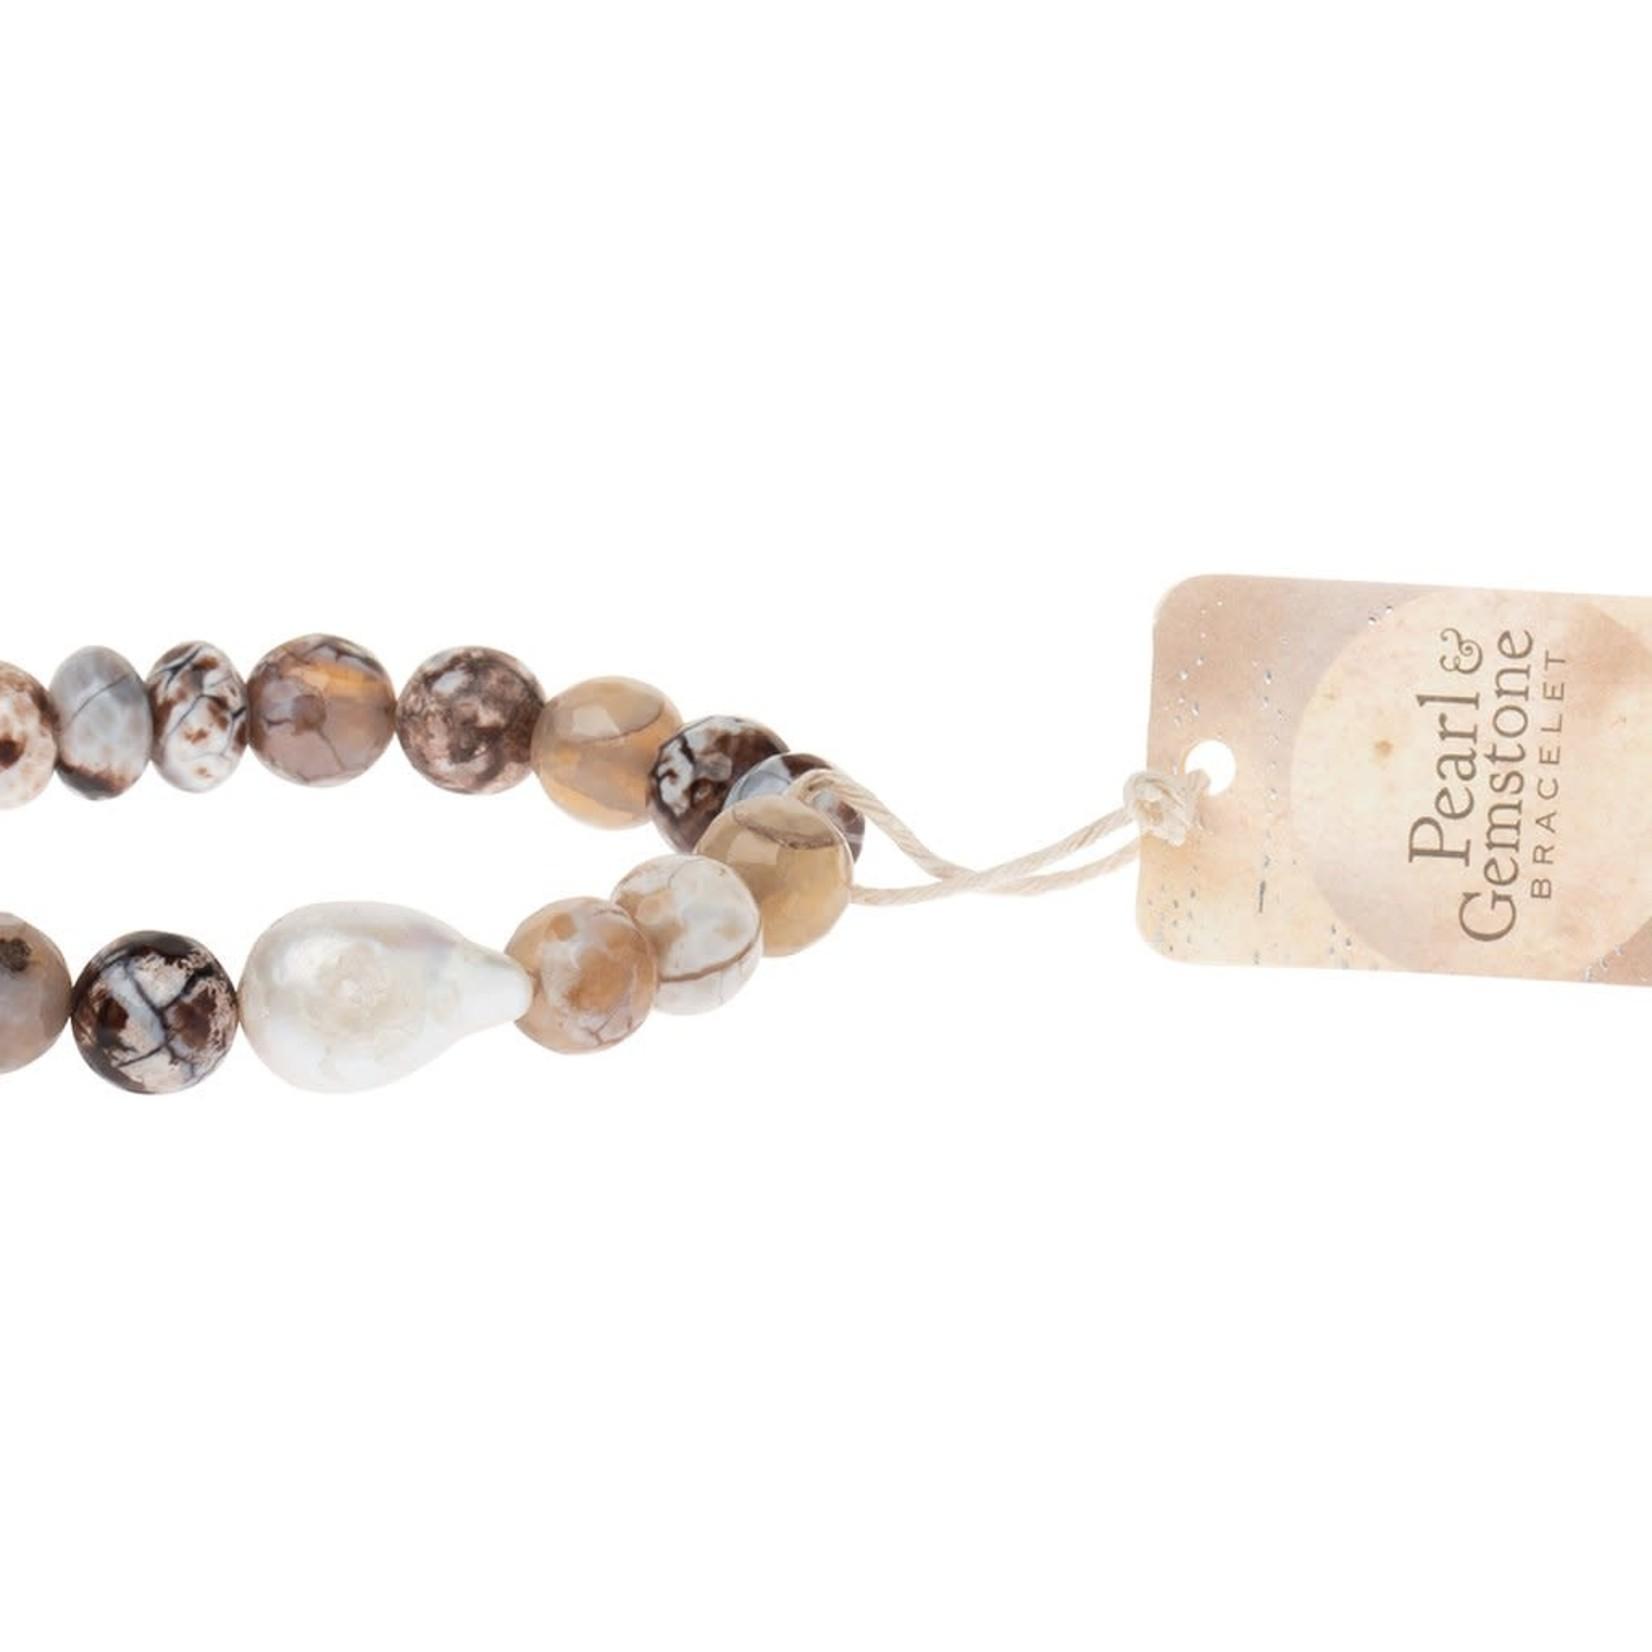 Scout PB005 Pearl & Gemstone Bracelet - Mauve Agate